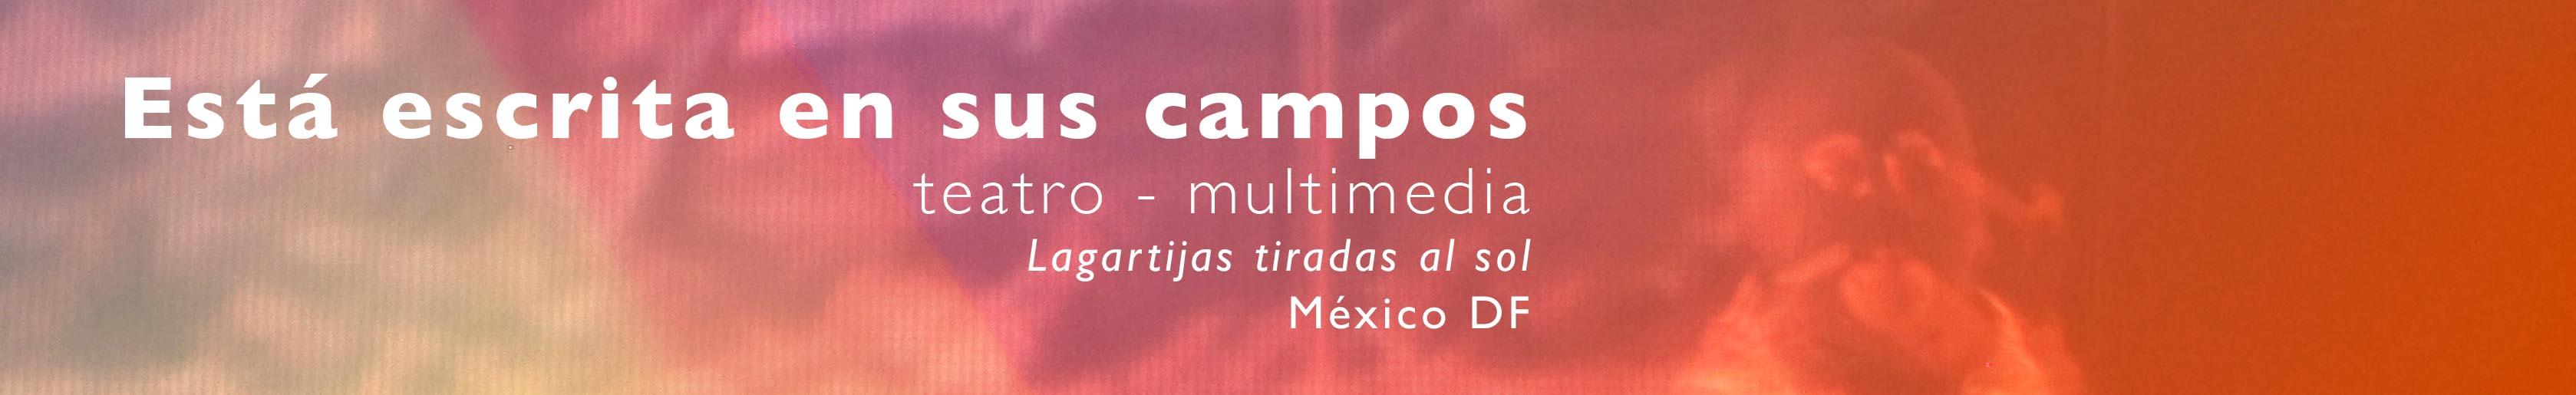 banner UV Lagartijas tiradas en INTERMEDIO 2014